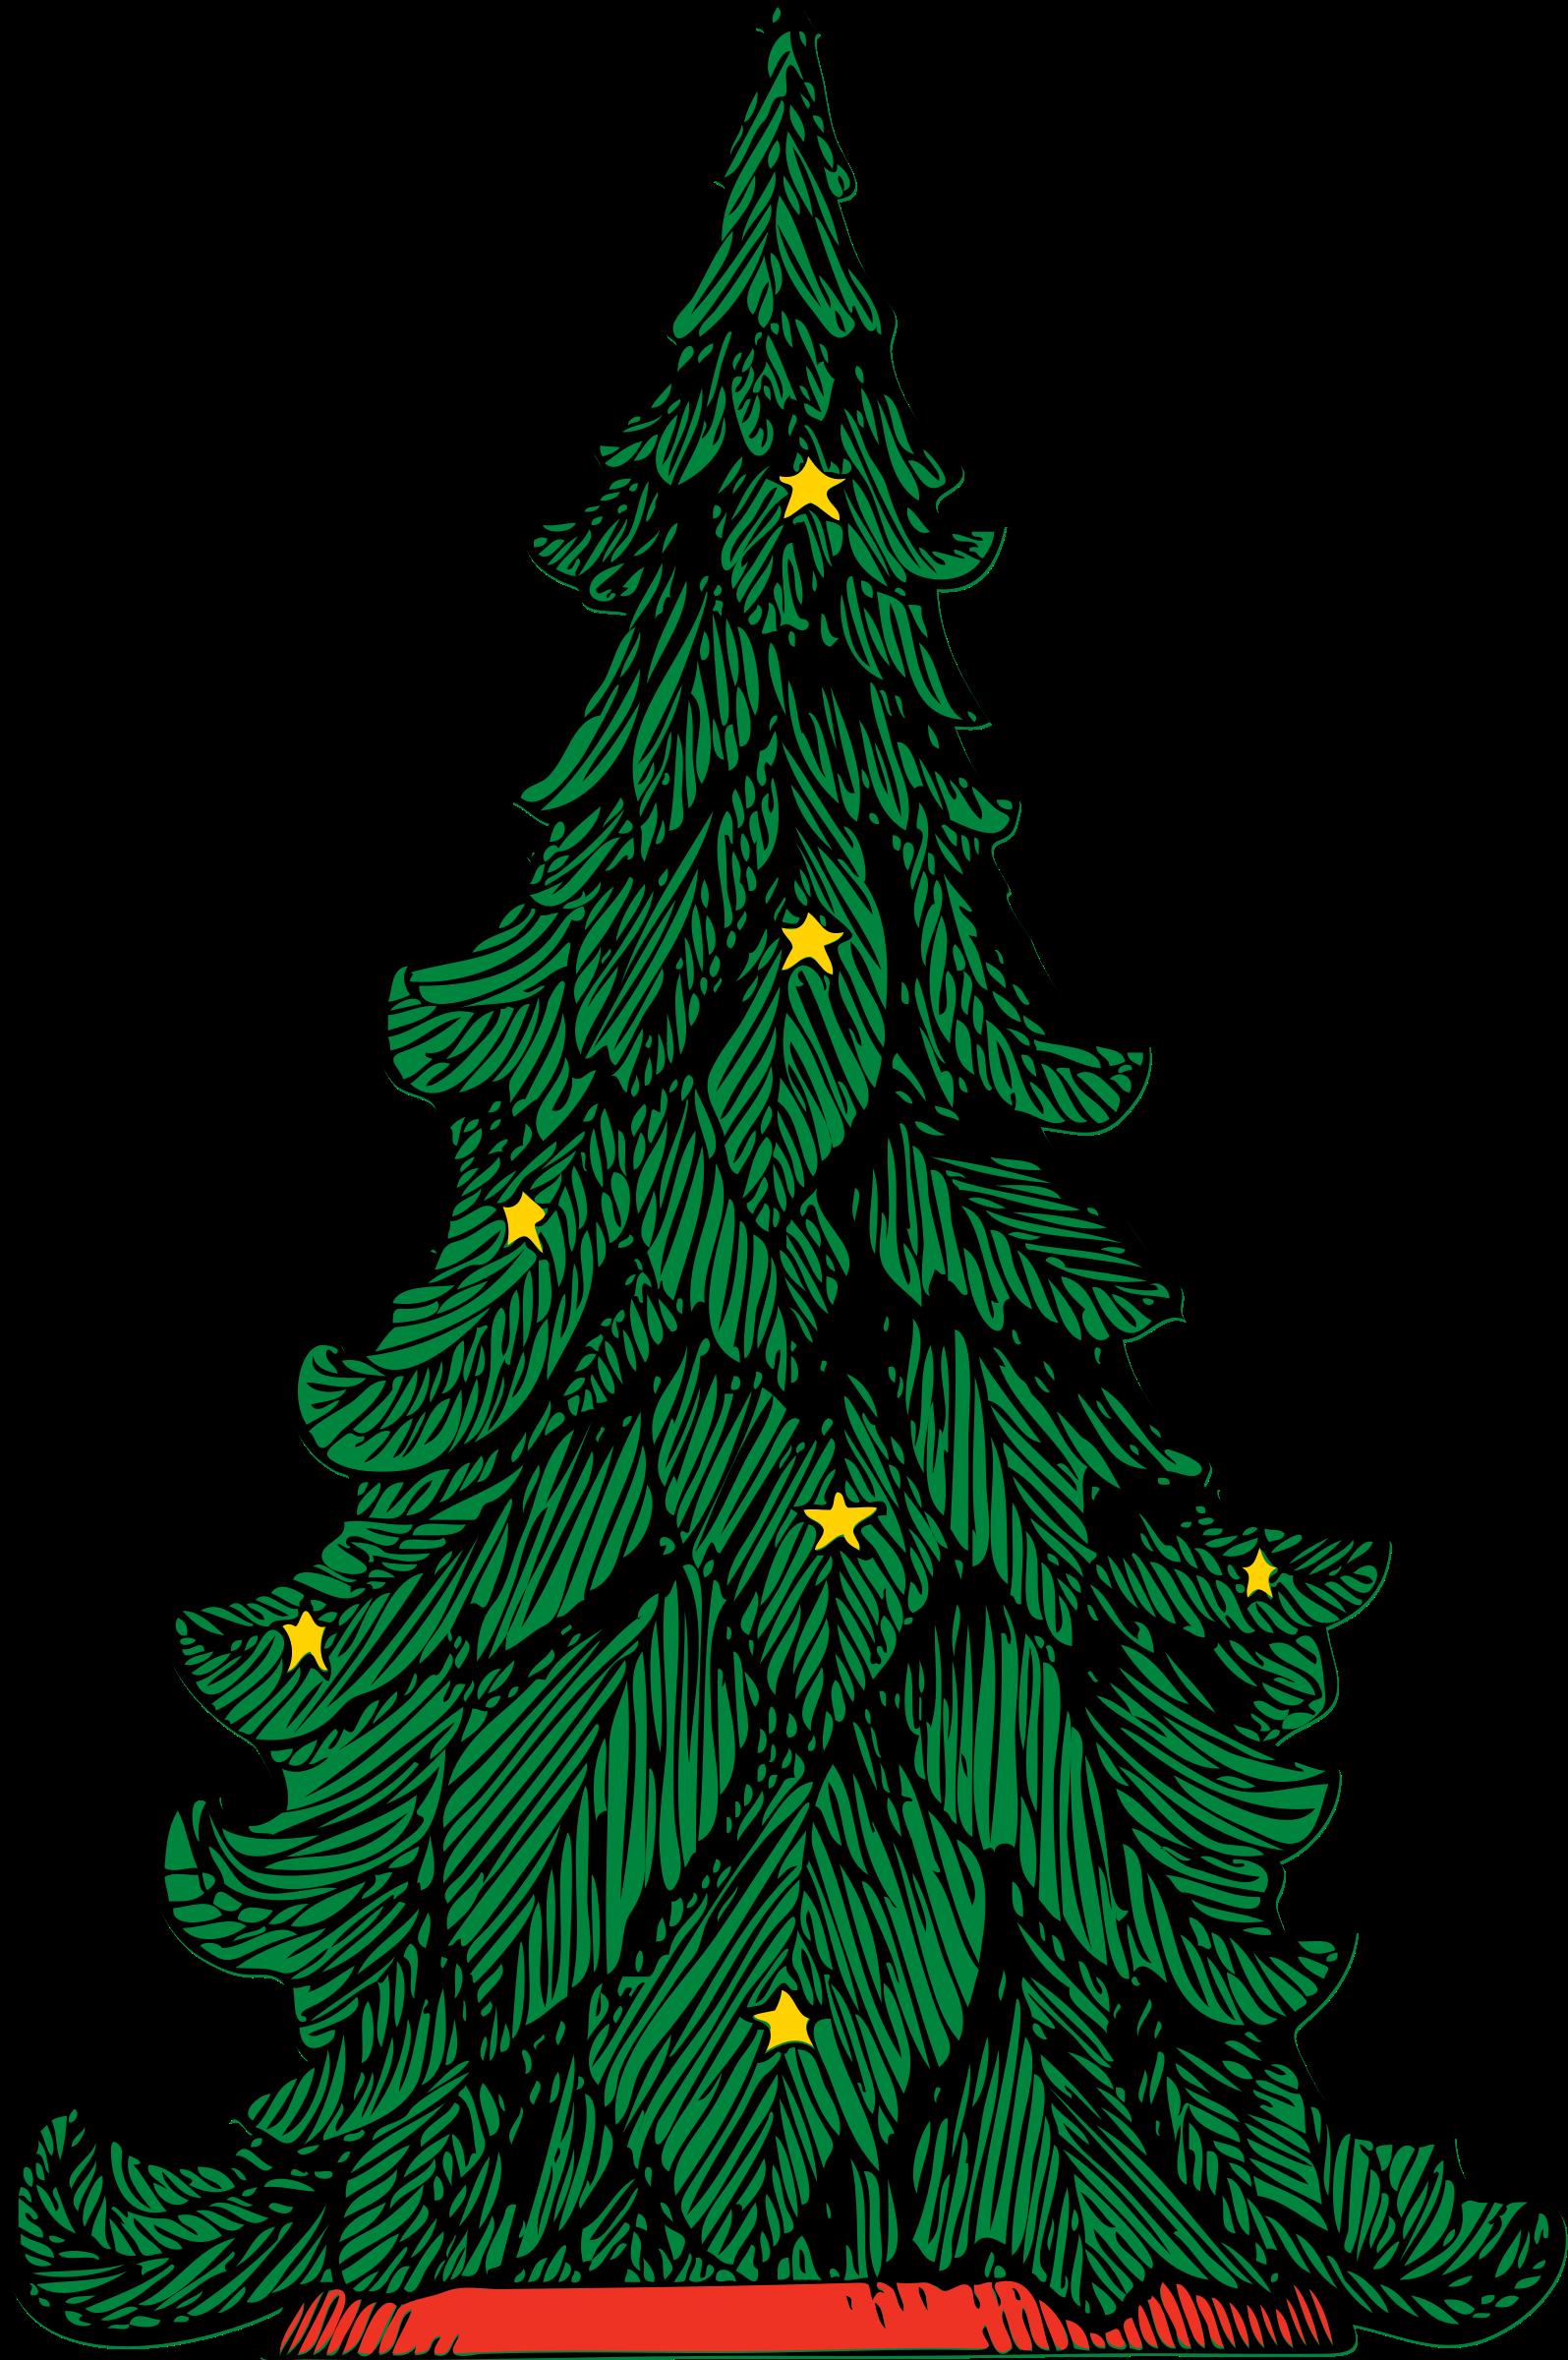 Plain christmas tree clipart banner library stock Clipart - Christmas tree banner library stock